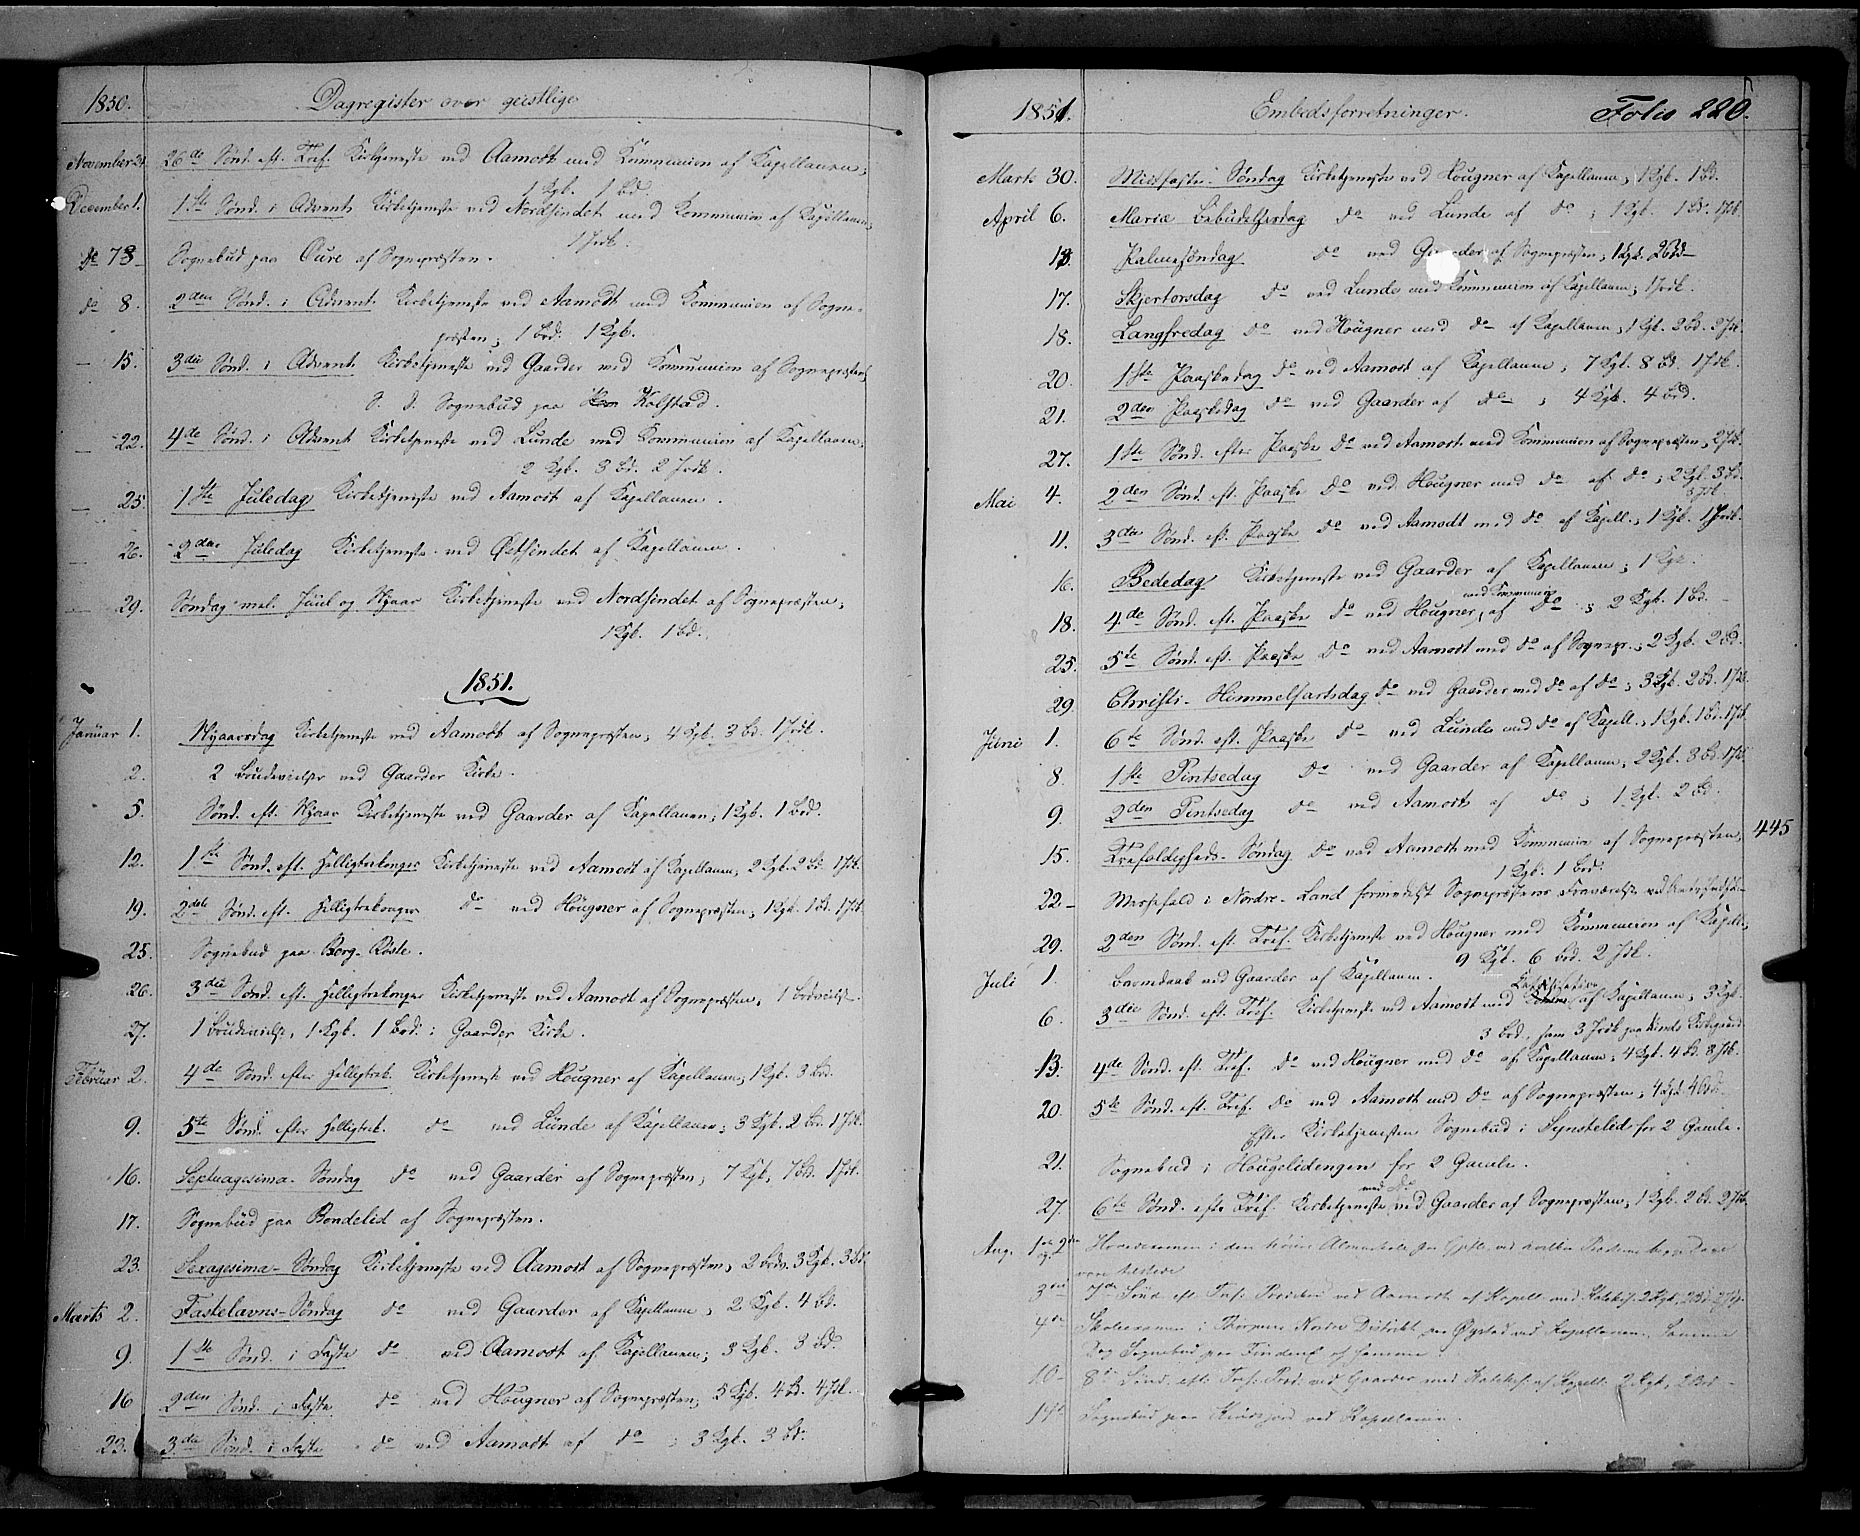 SAH, Land prestekontor, Ministerialbok nr. 10, 1847-1859, s. 220